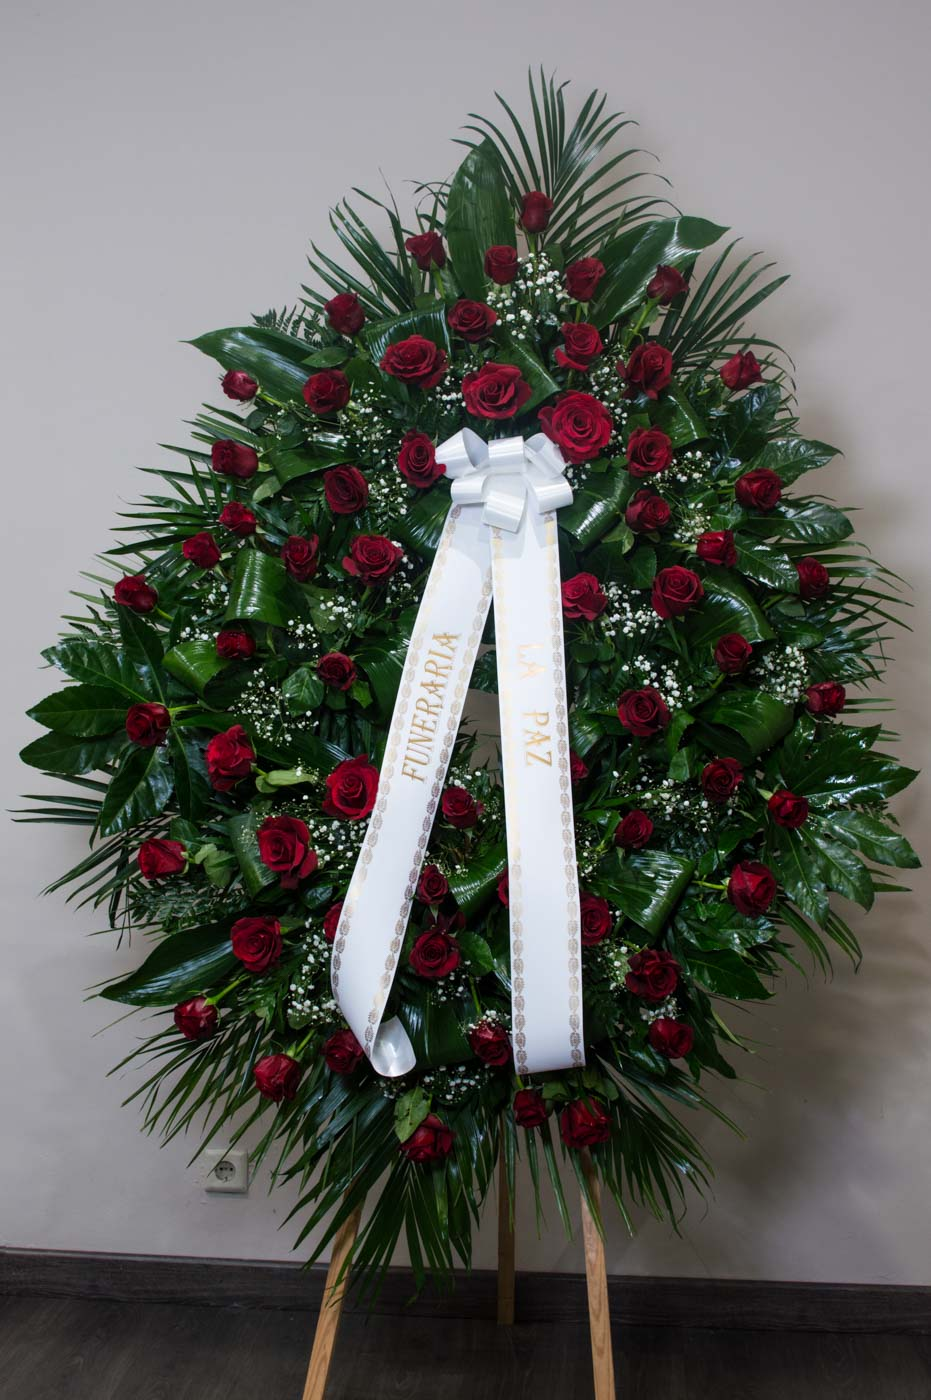 Corona de rosas - Funeraria La Paz Verín